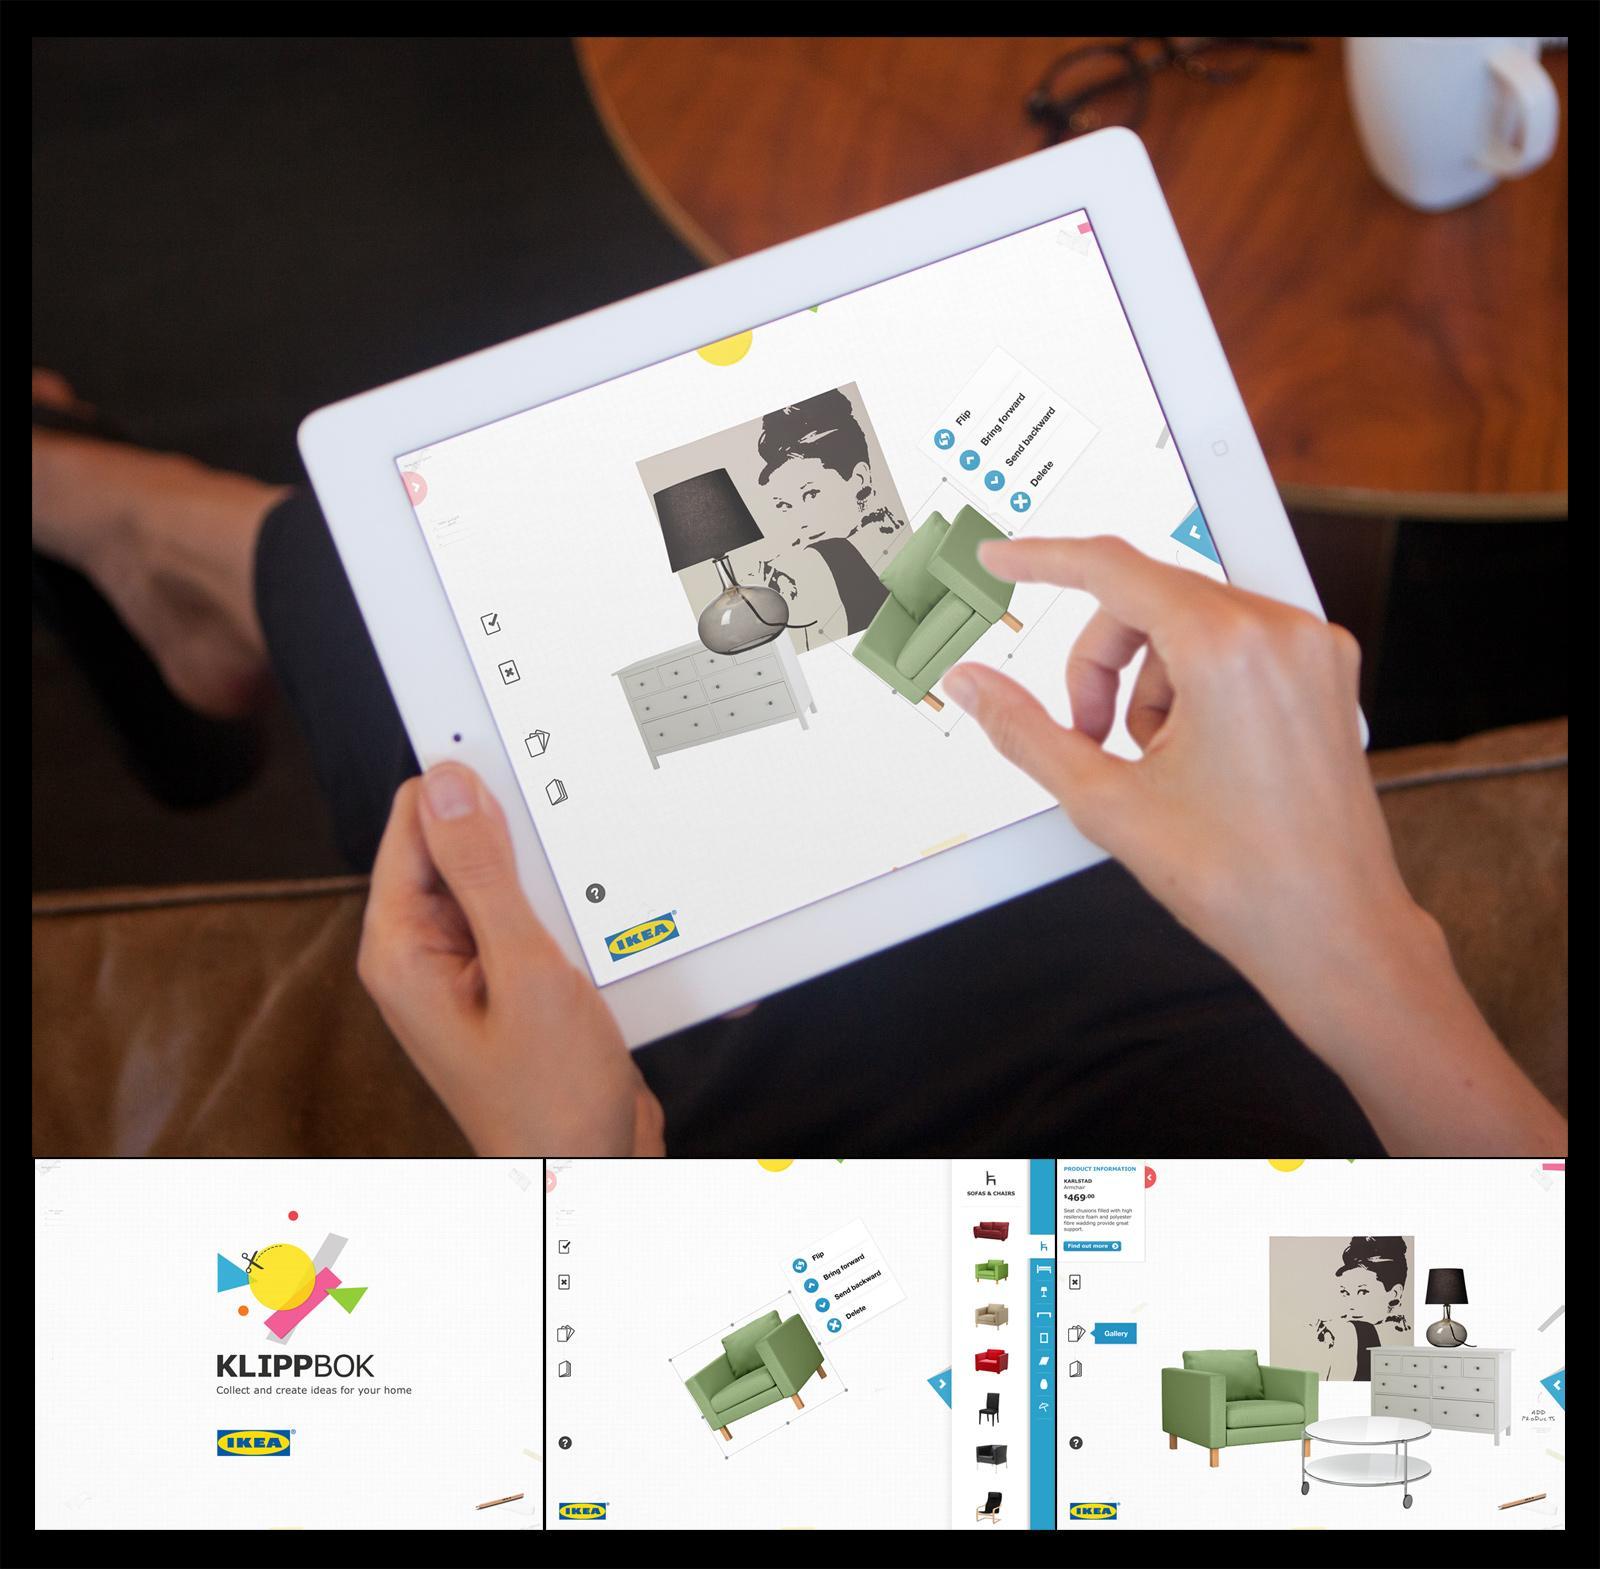 IKEA Digital Ad -  Klippbok iPad App